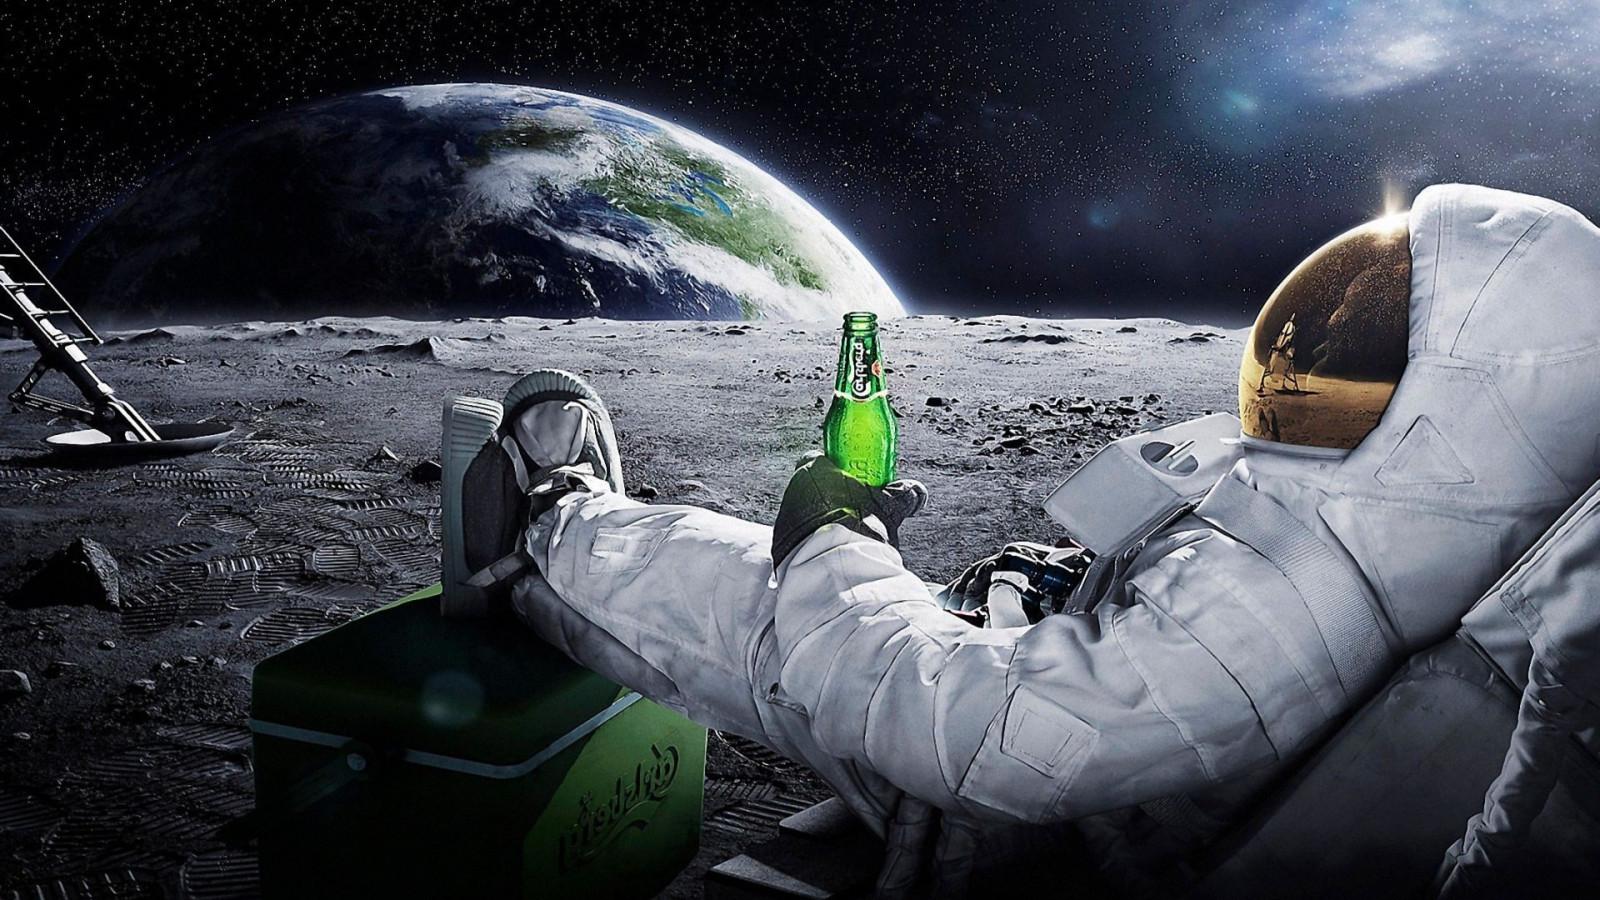 Fondos De Pantalla : 1920x1080 Px, Astronauta, Cerveza